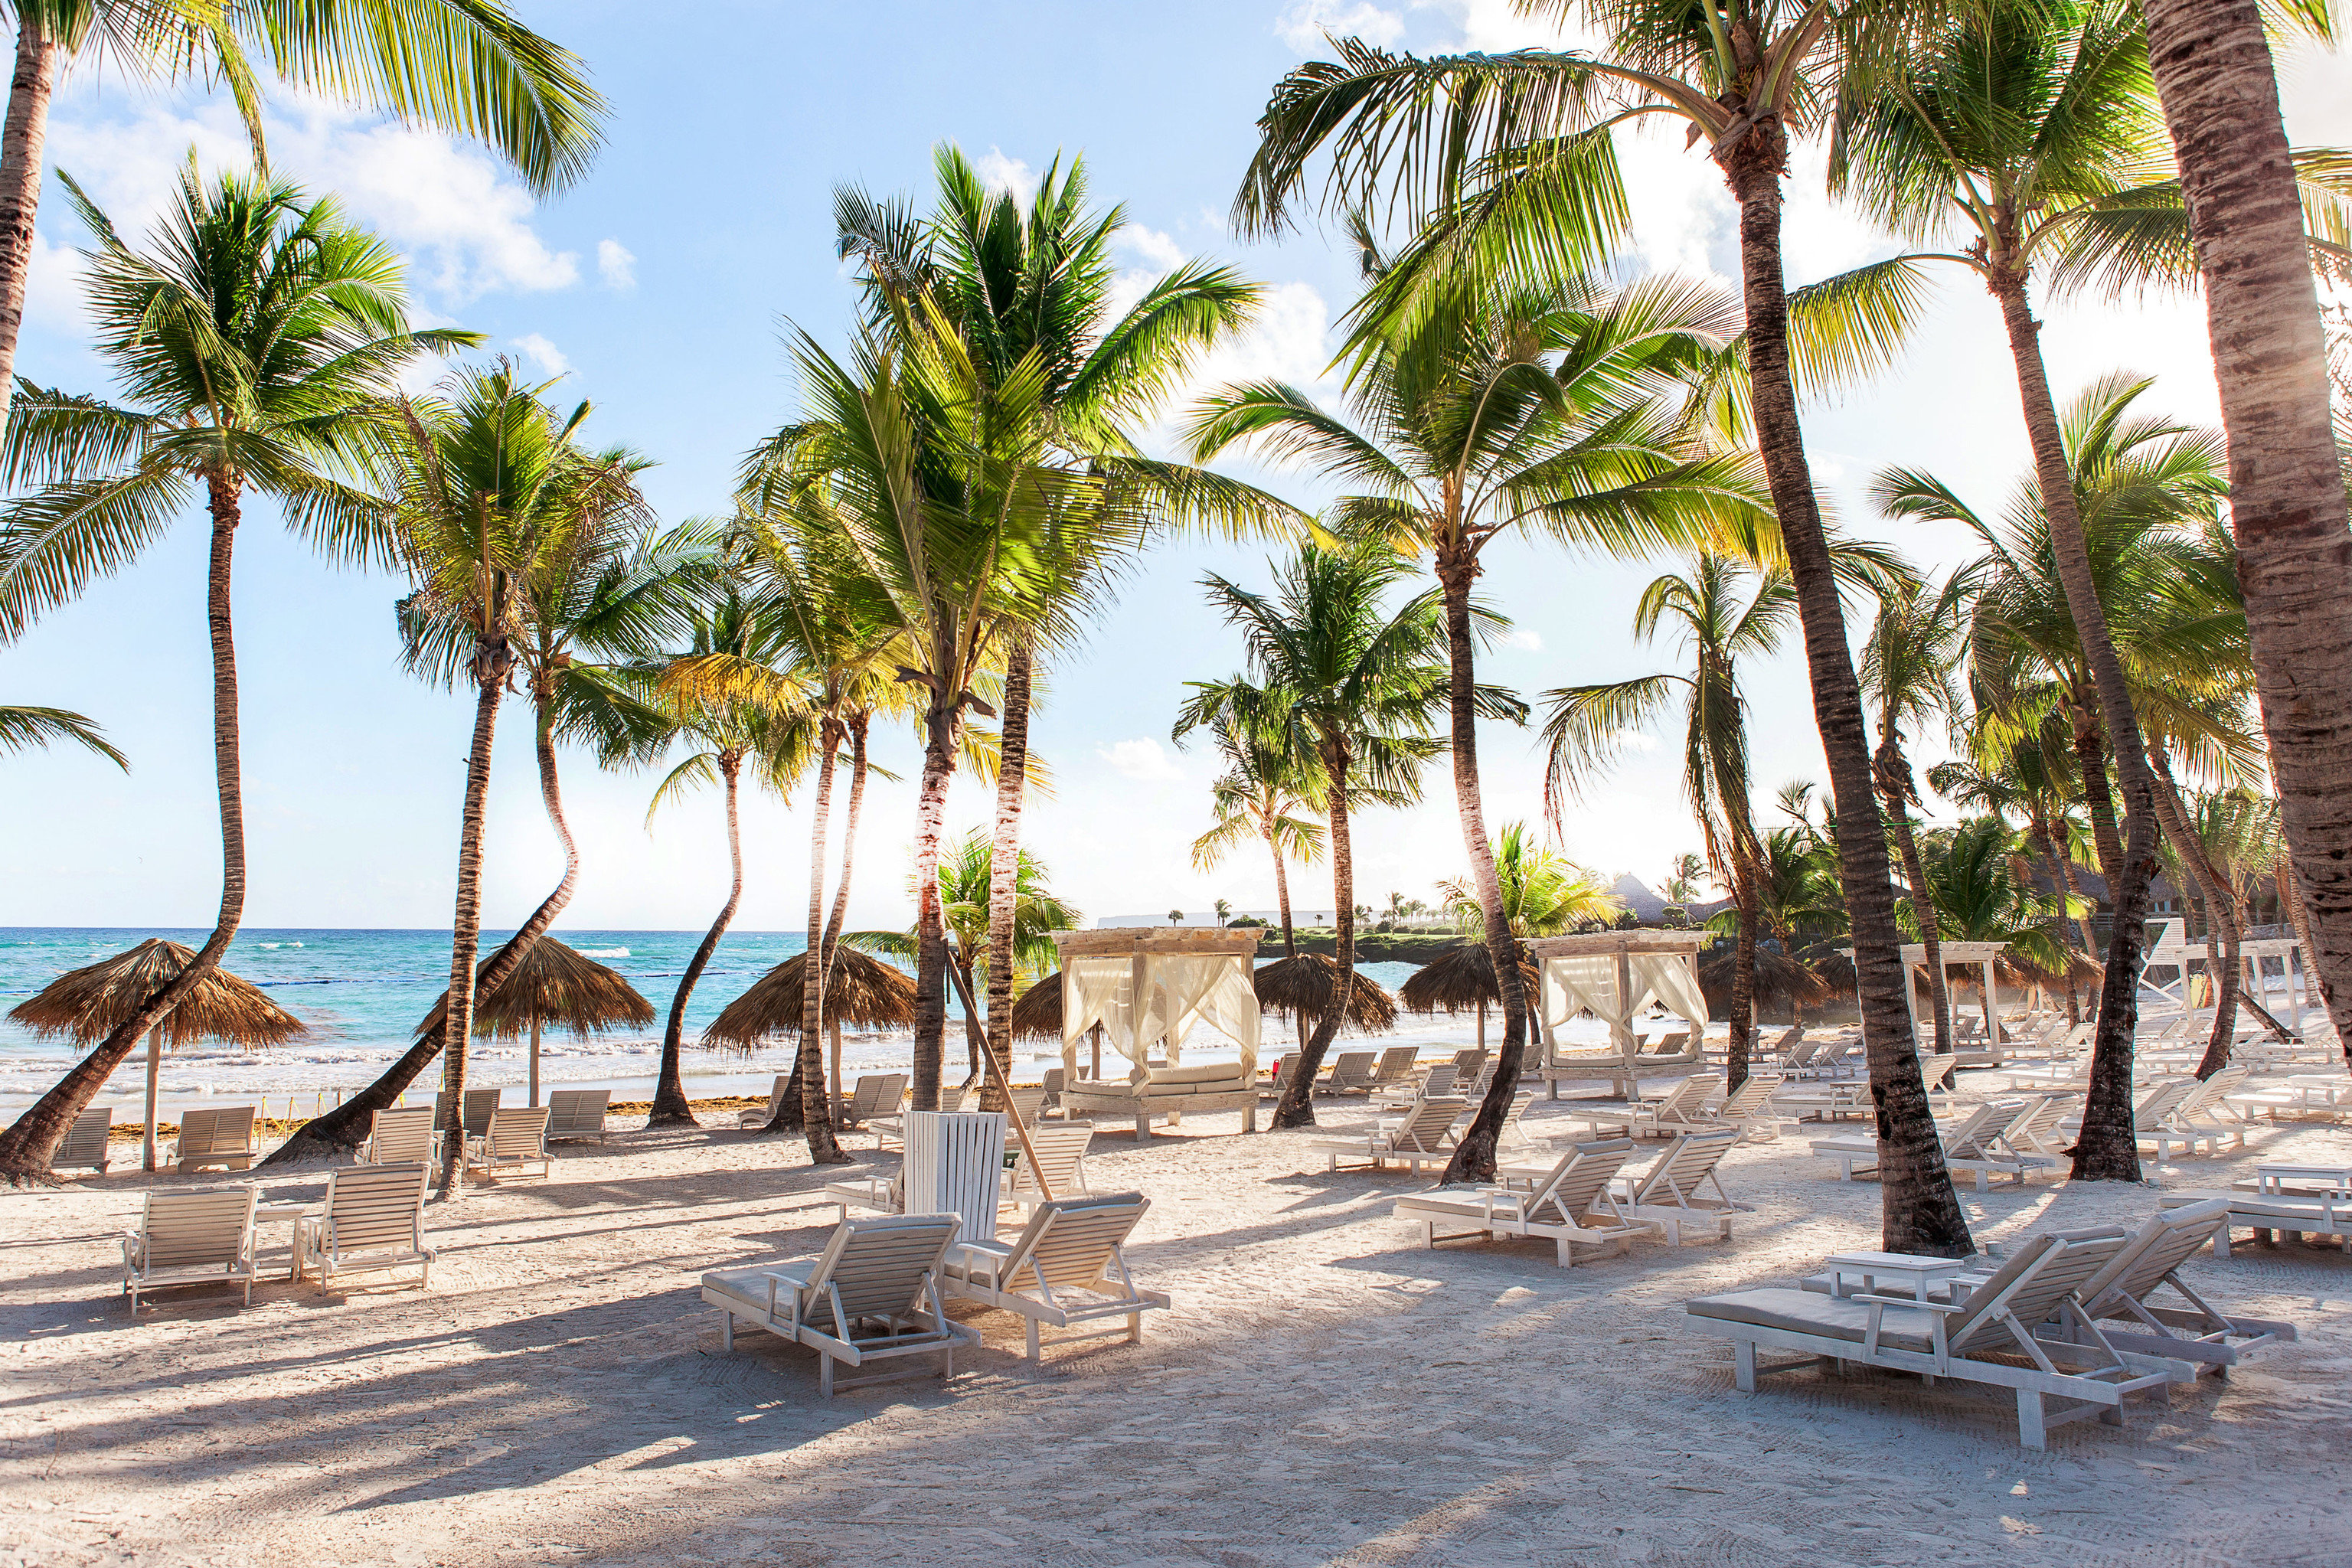 News Trip Ideas tree outdoor palm ground giraffe sky water plant Beach Resort vacation sandy caribbean palm family arecales tropics estate walkway Sea Pool shade lined shore several